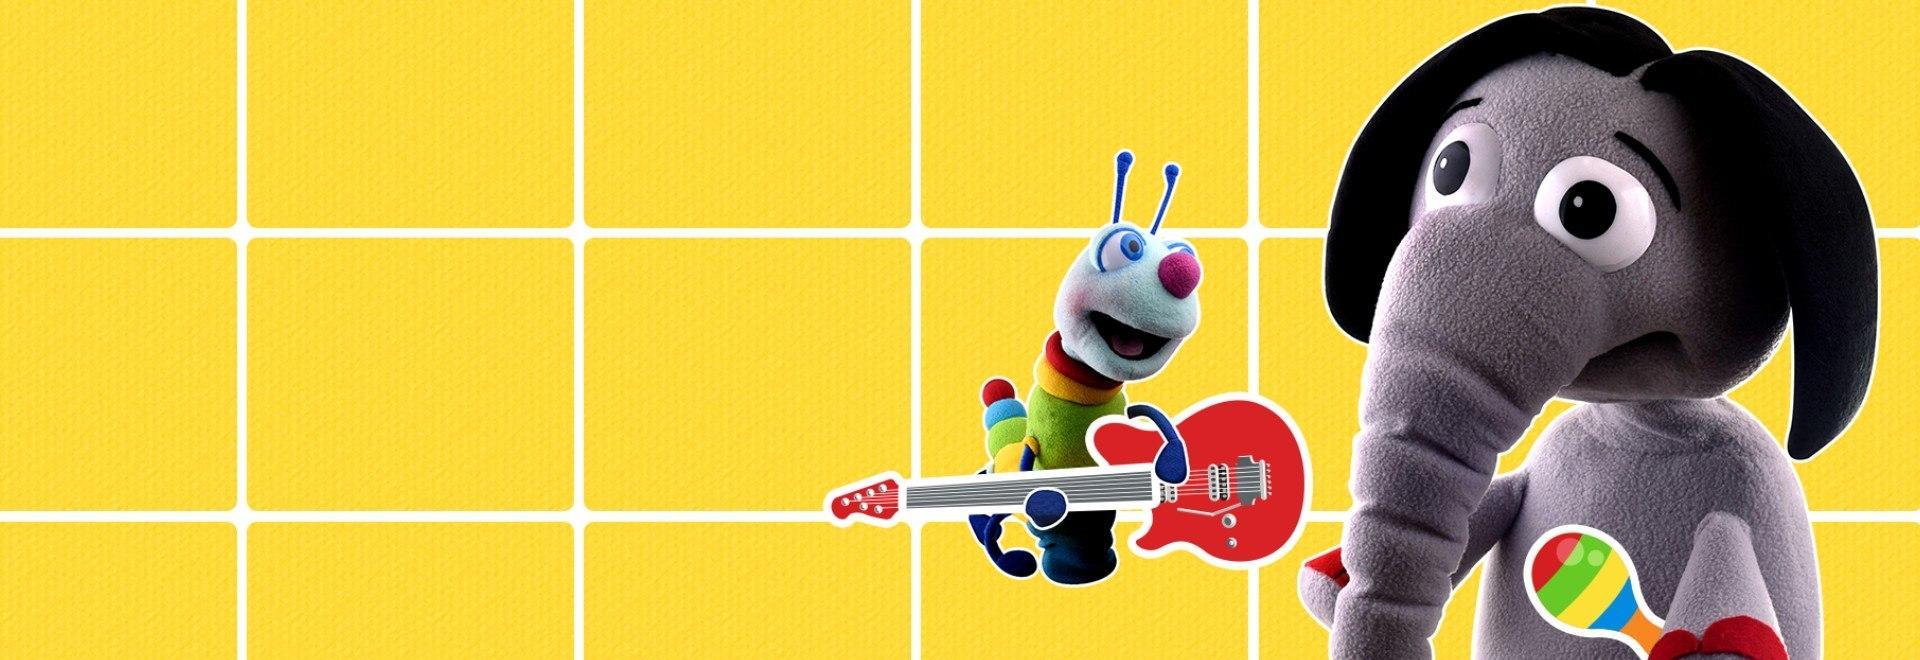 Patatine / Tromba / Rock 'n' Roll